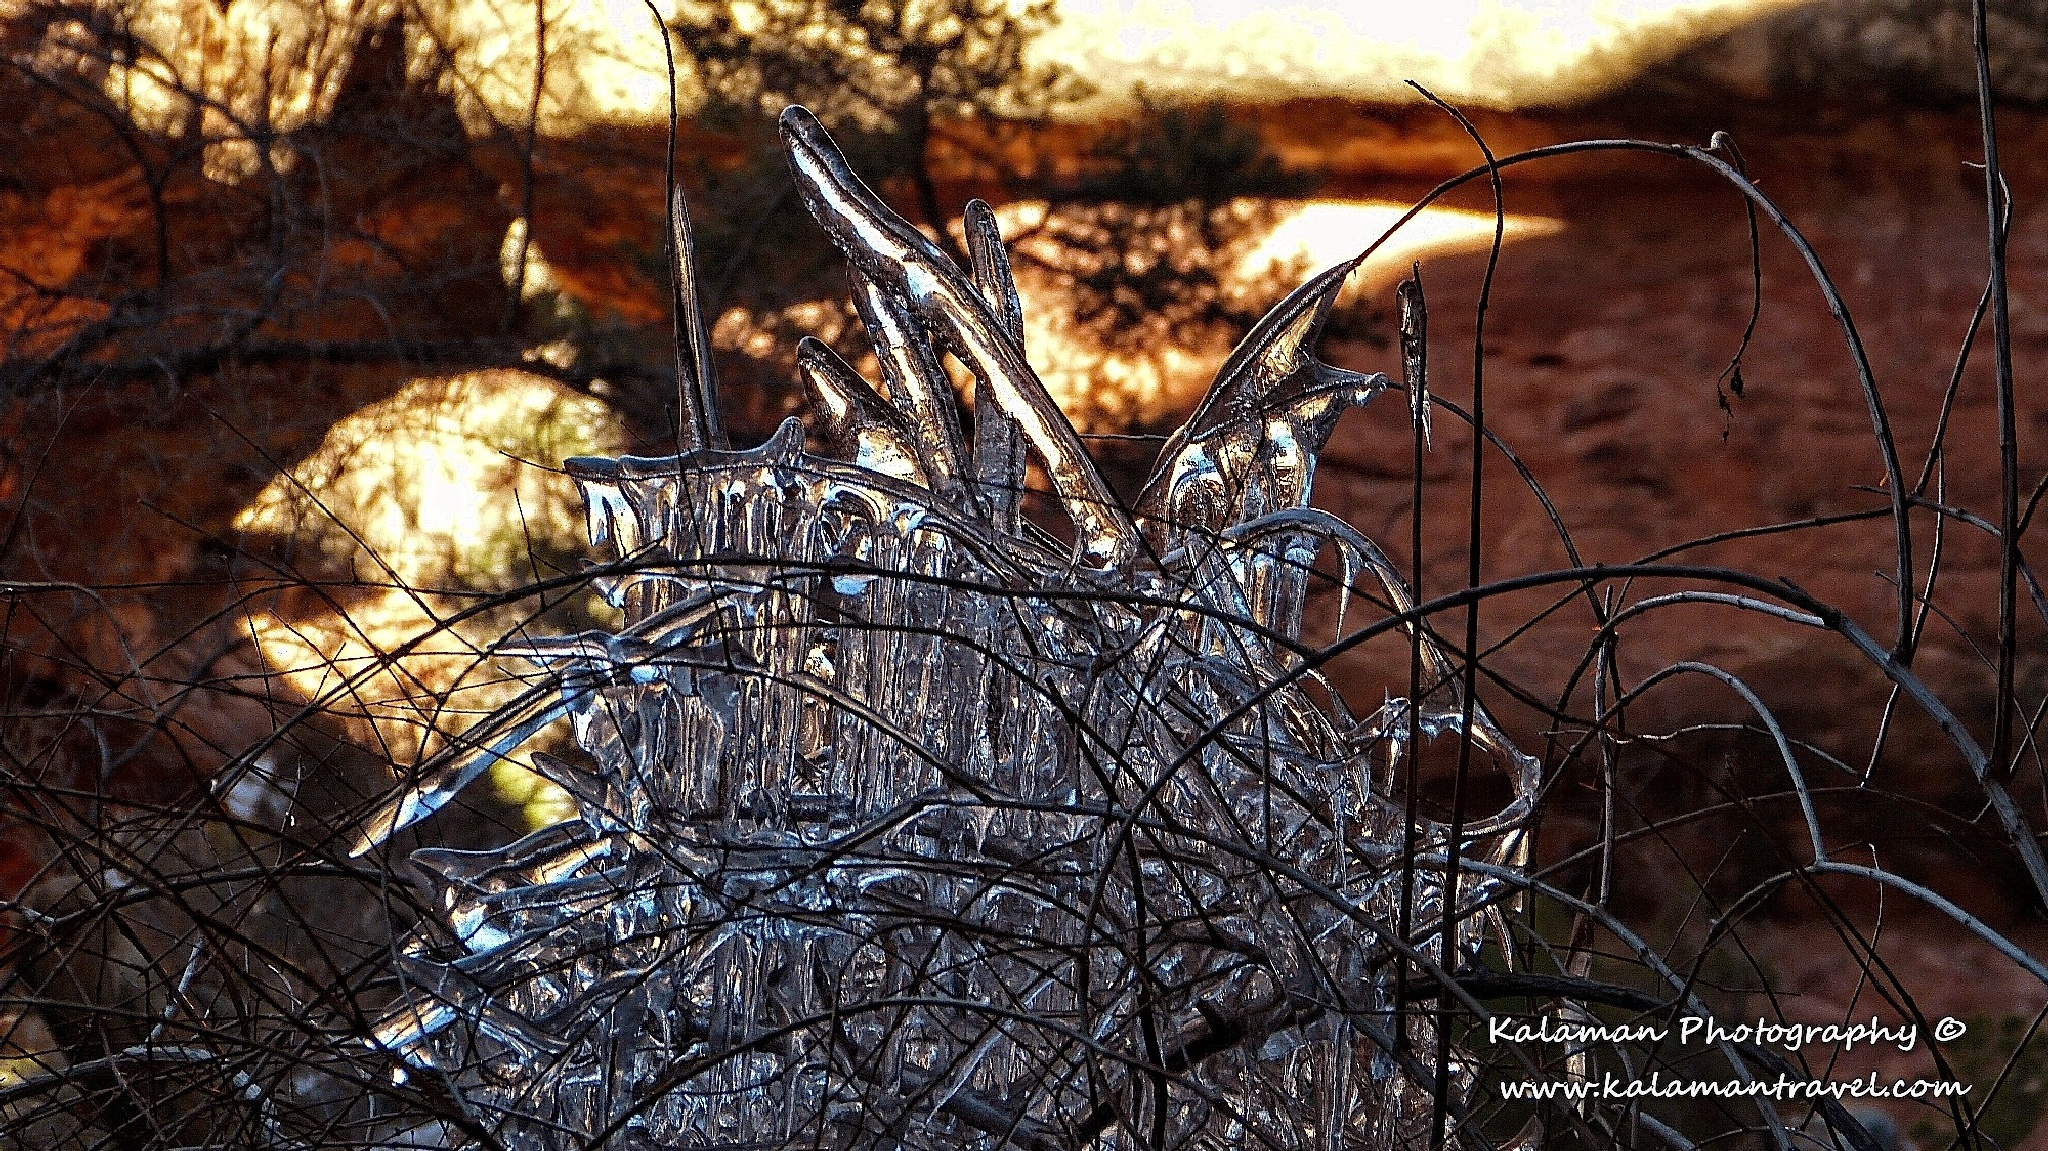 Cold by Kalaman Photography